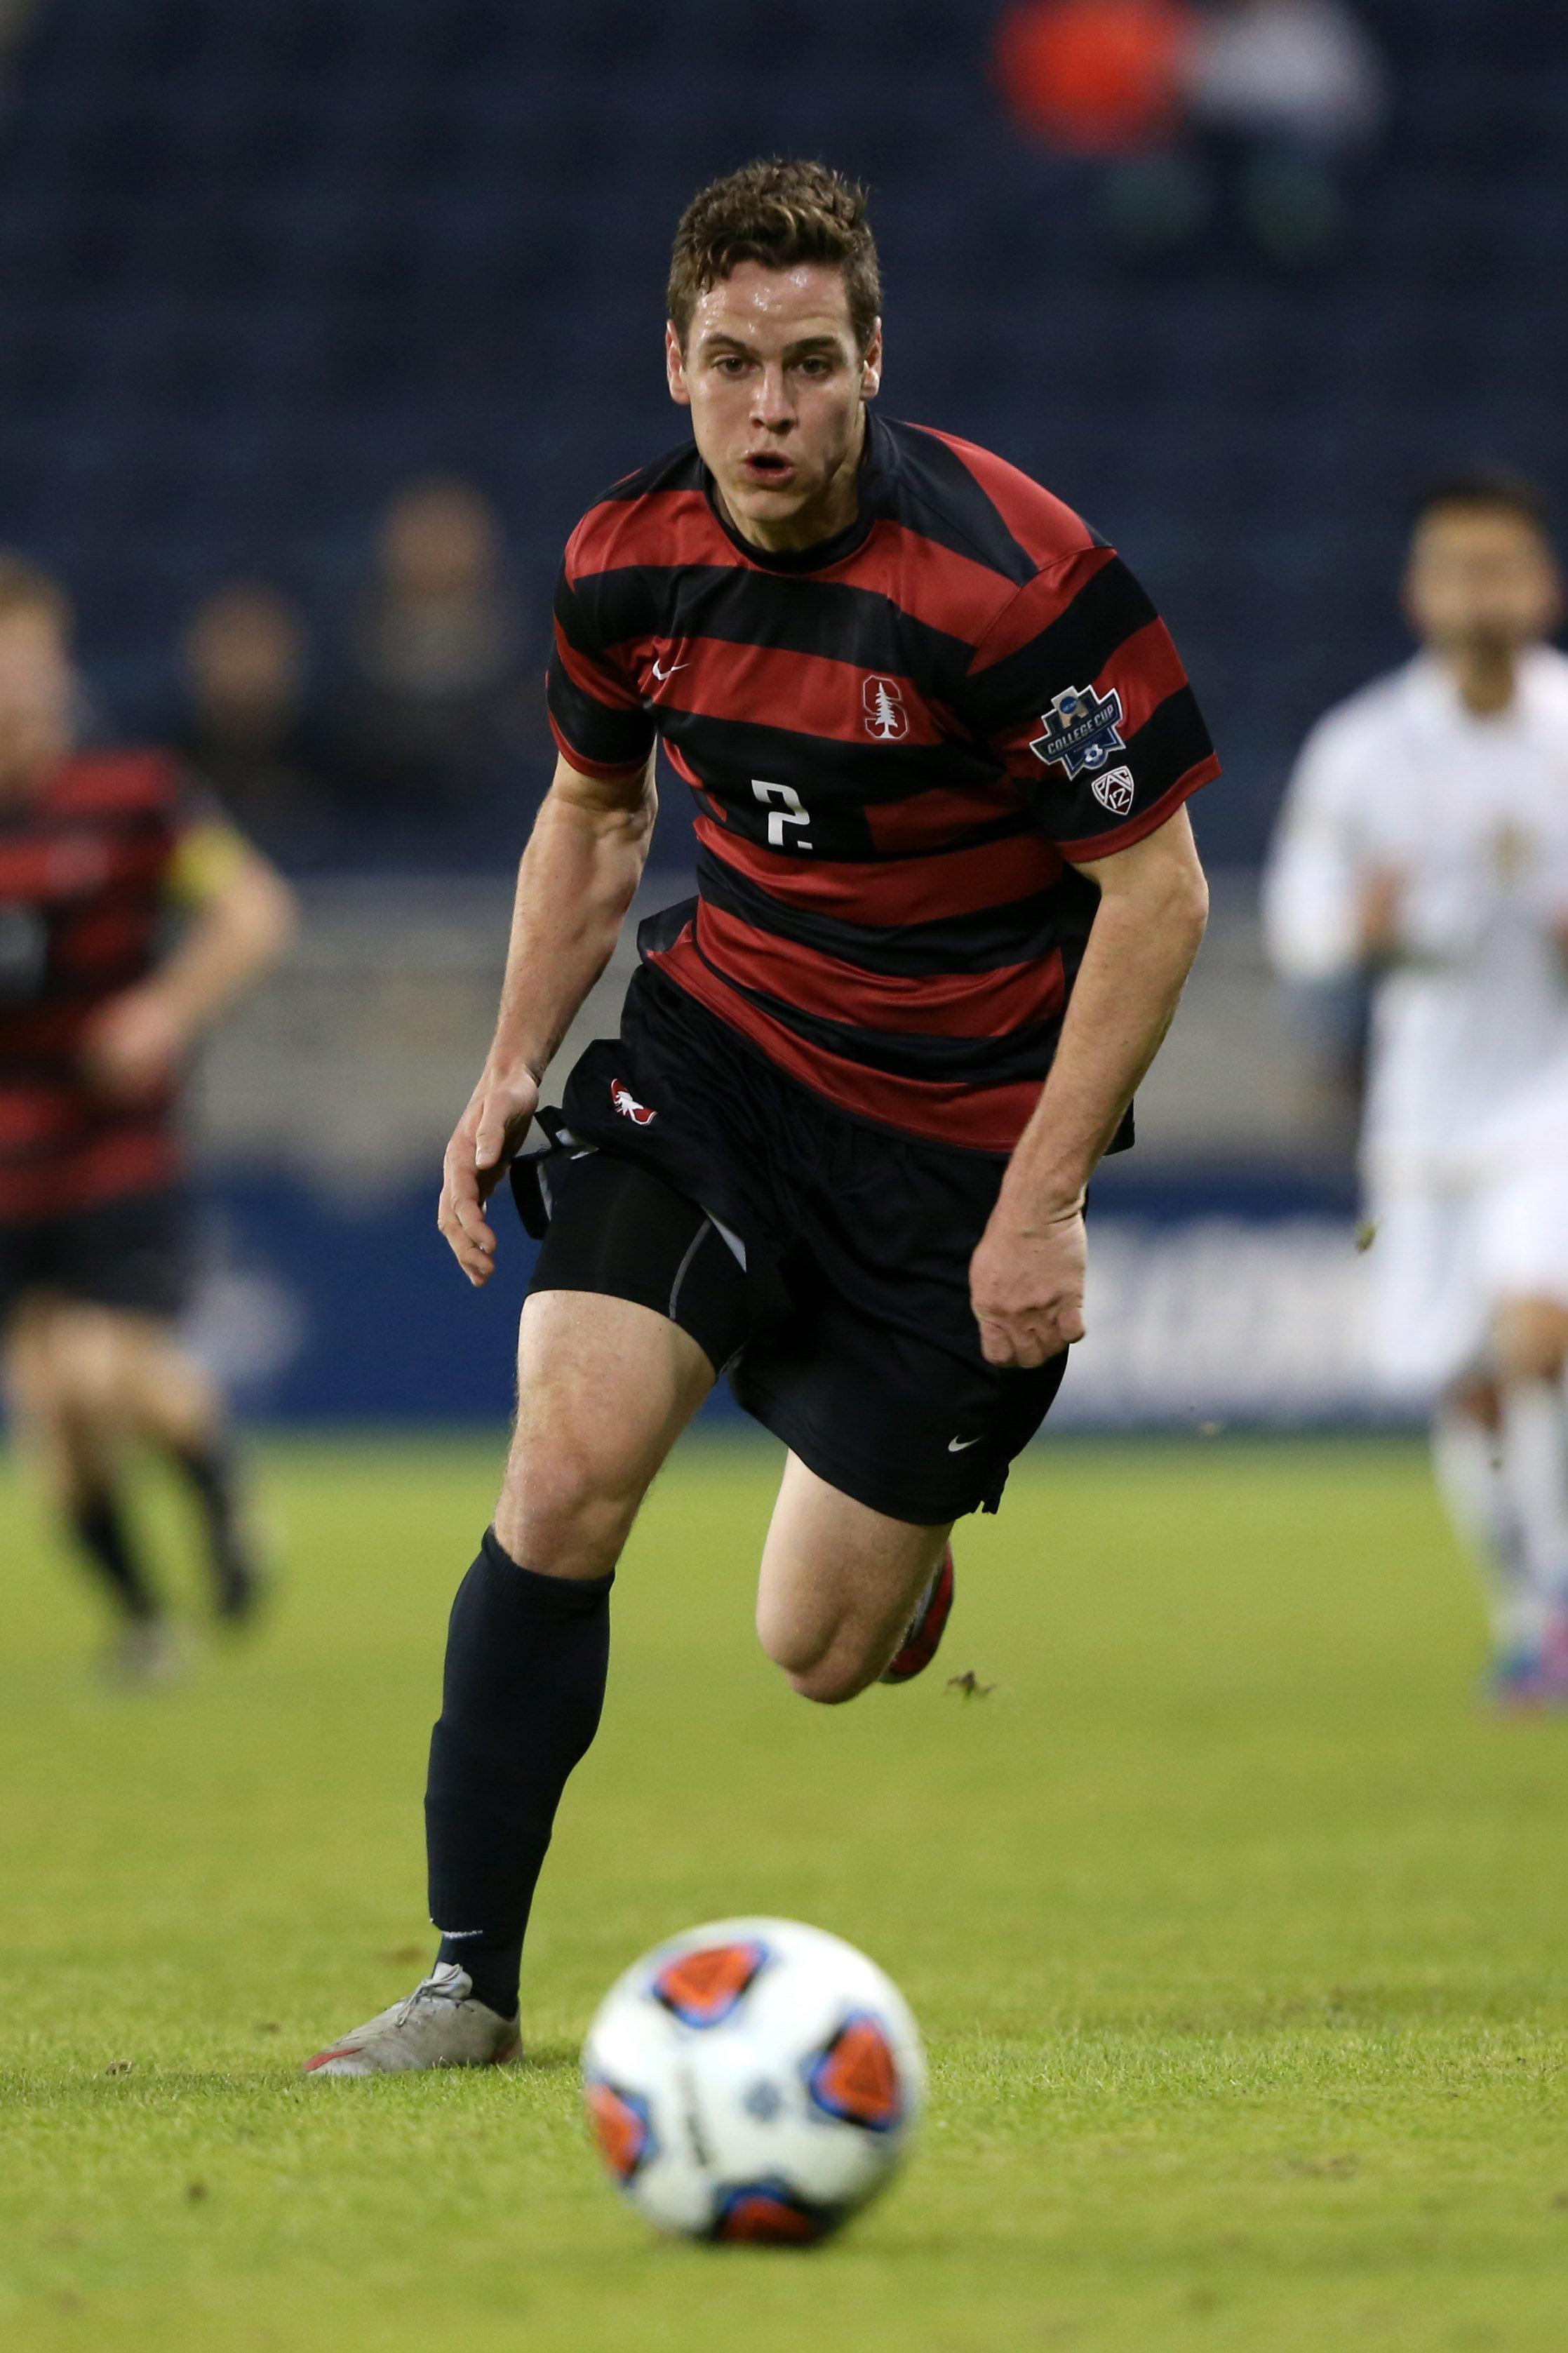 NCAA SOCCER: DEC 11 Men's College Cup - Akron v Stanford